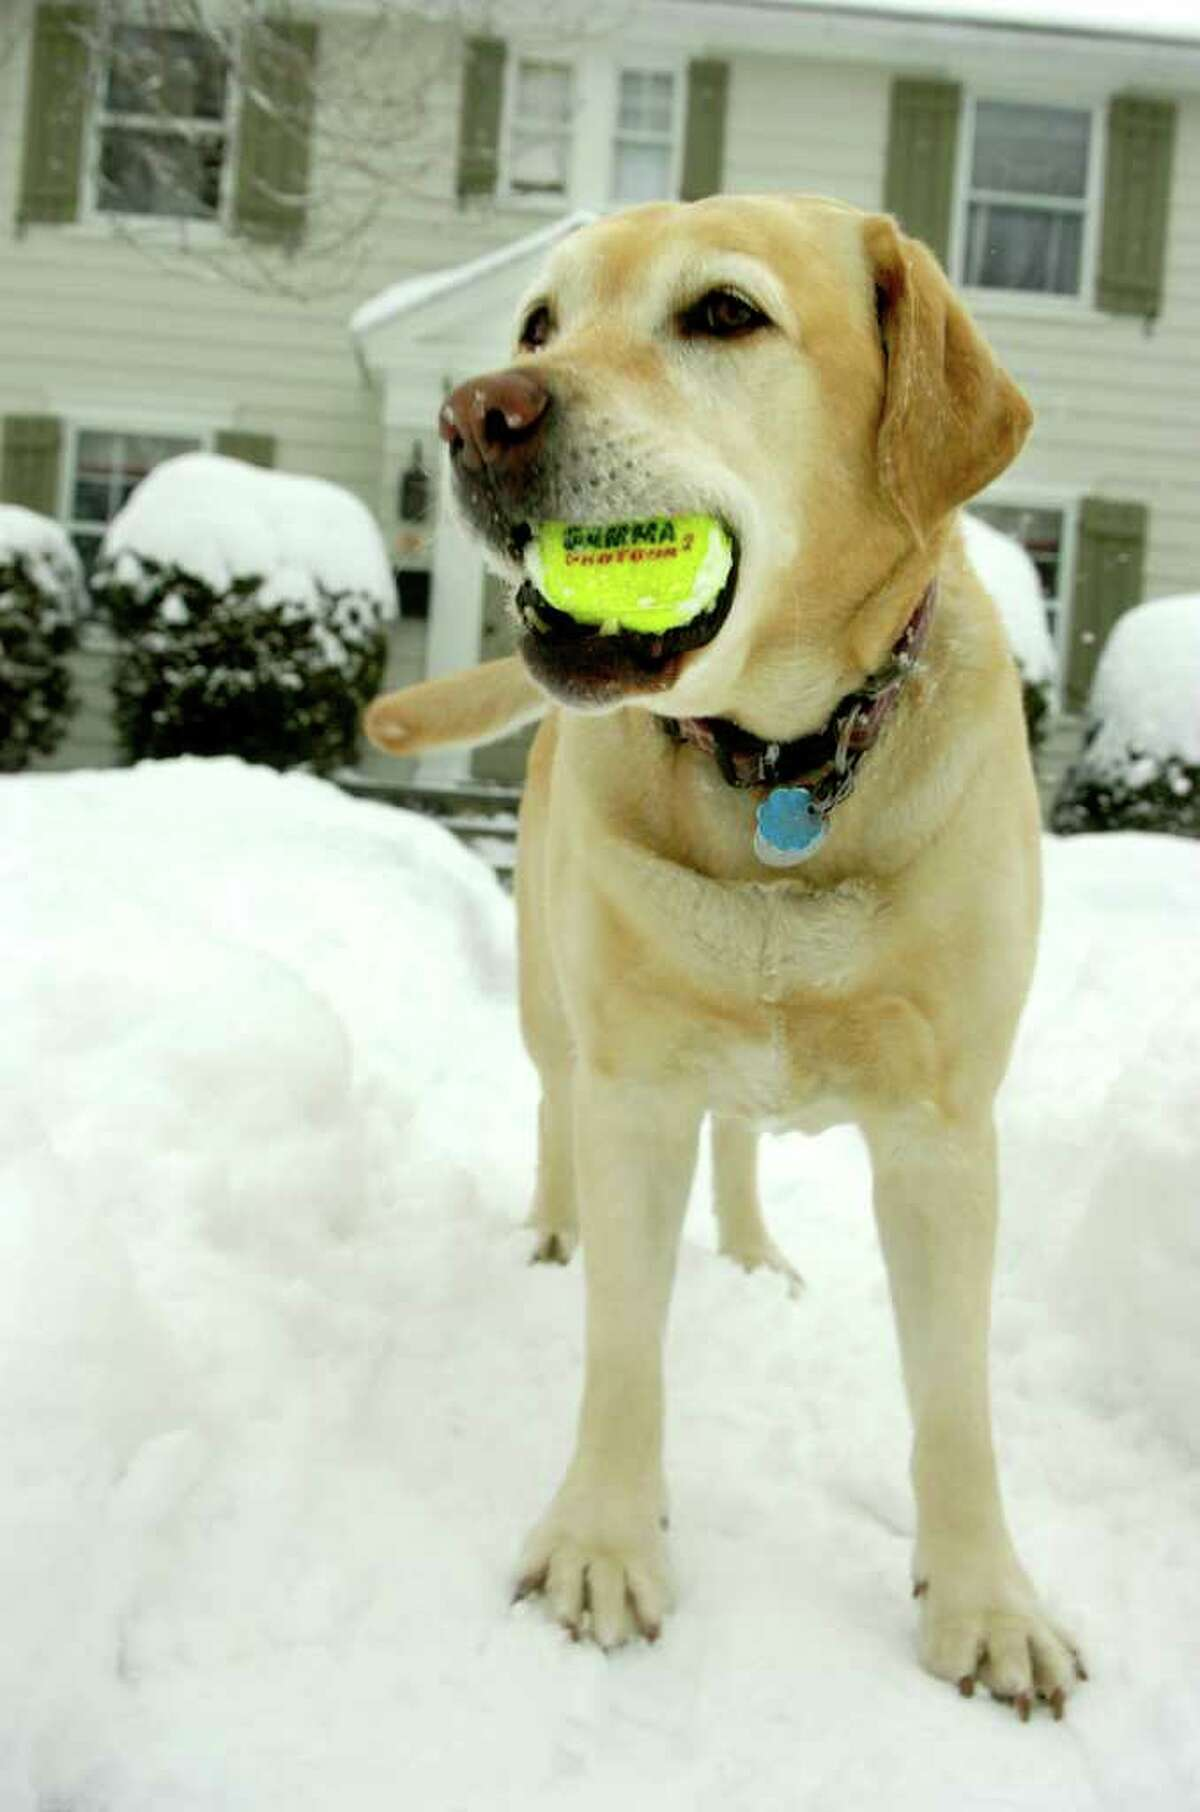 Nikki retrieves a tennis ball in the snow in Fairfield Wednesday, January 26, 2011.